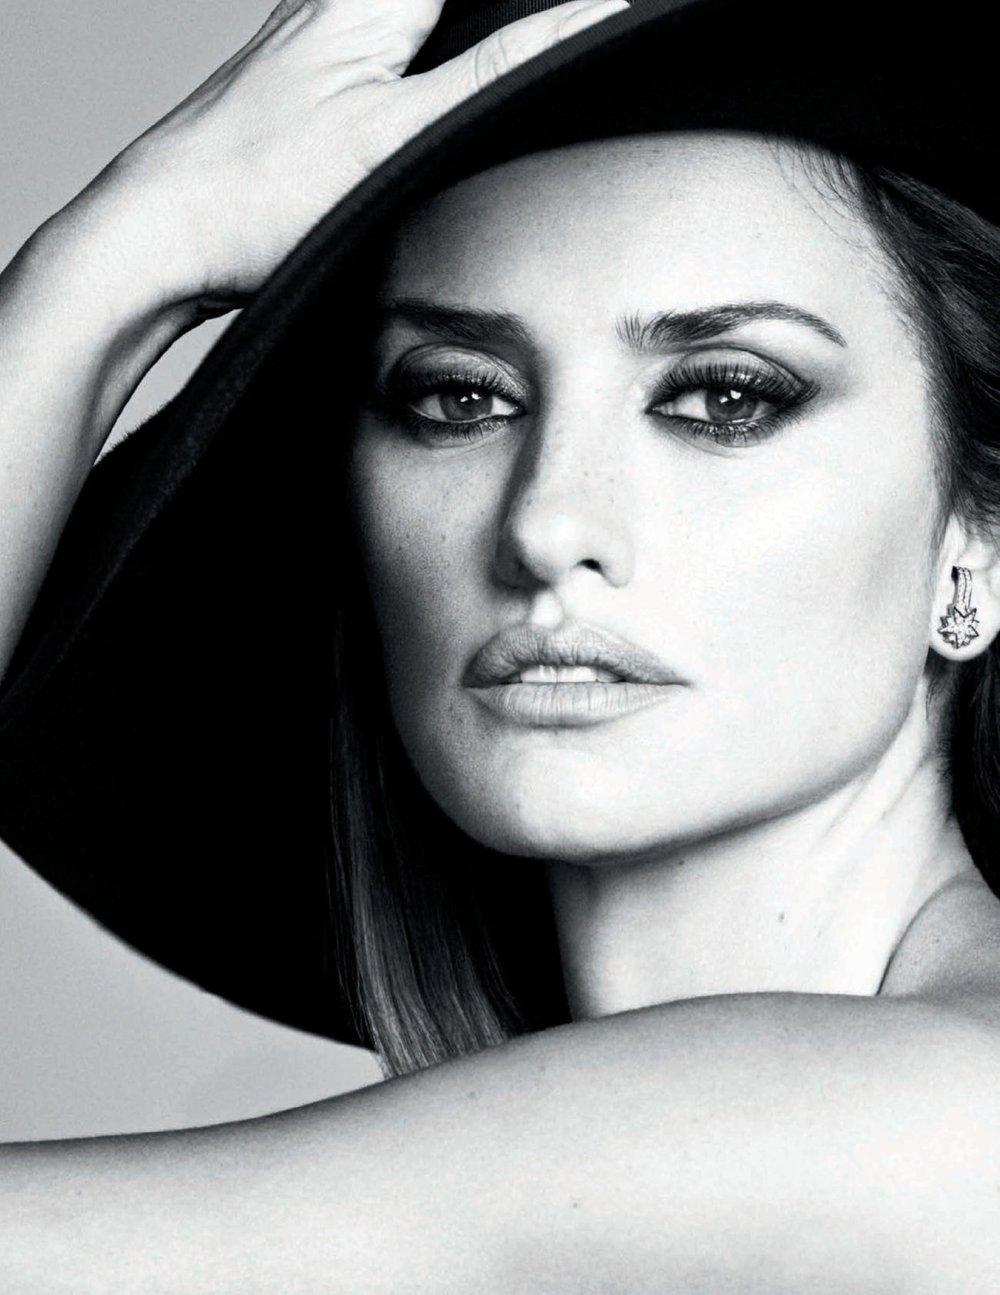 Penelope-Cruz-Luigi-Iango-Vogue-Spain-April-2019- (13).jpg